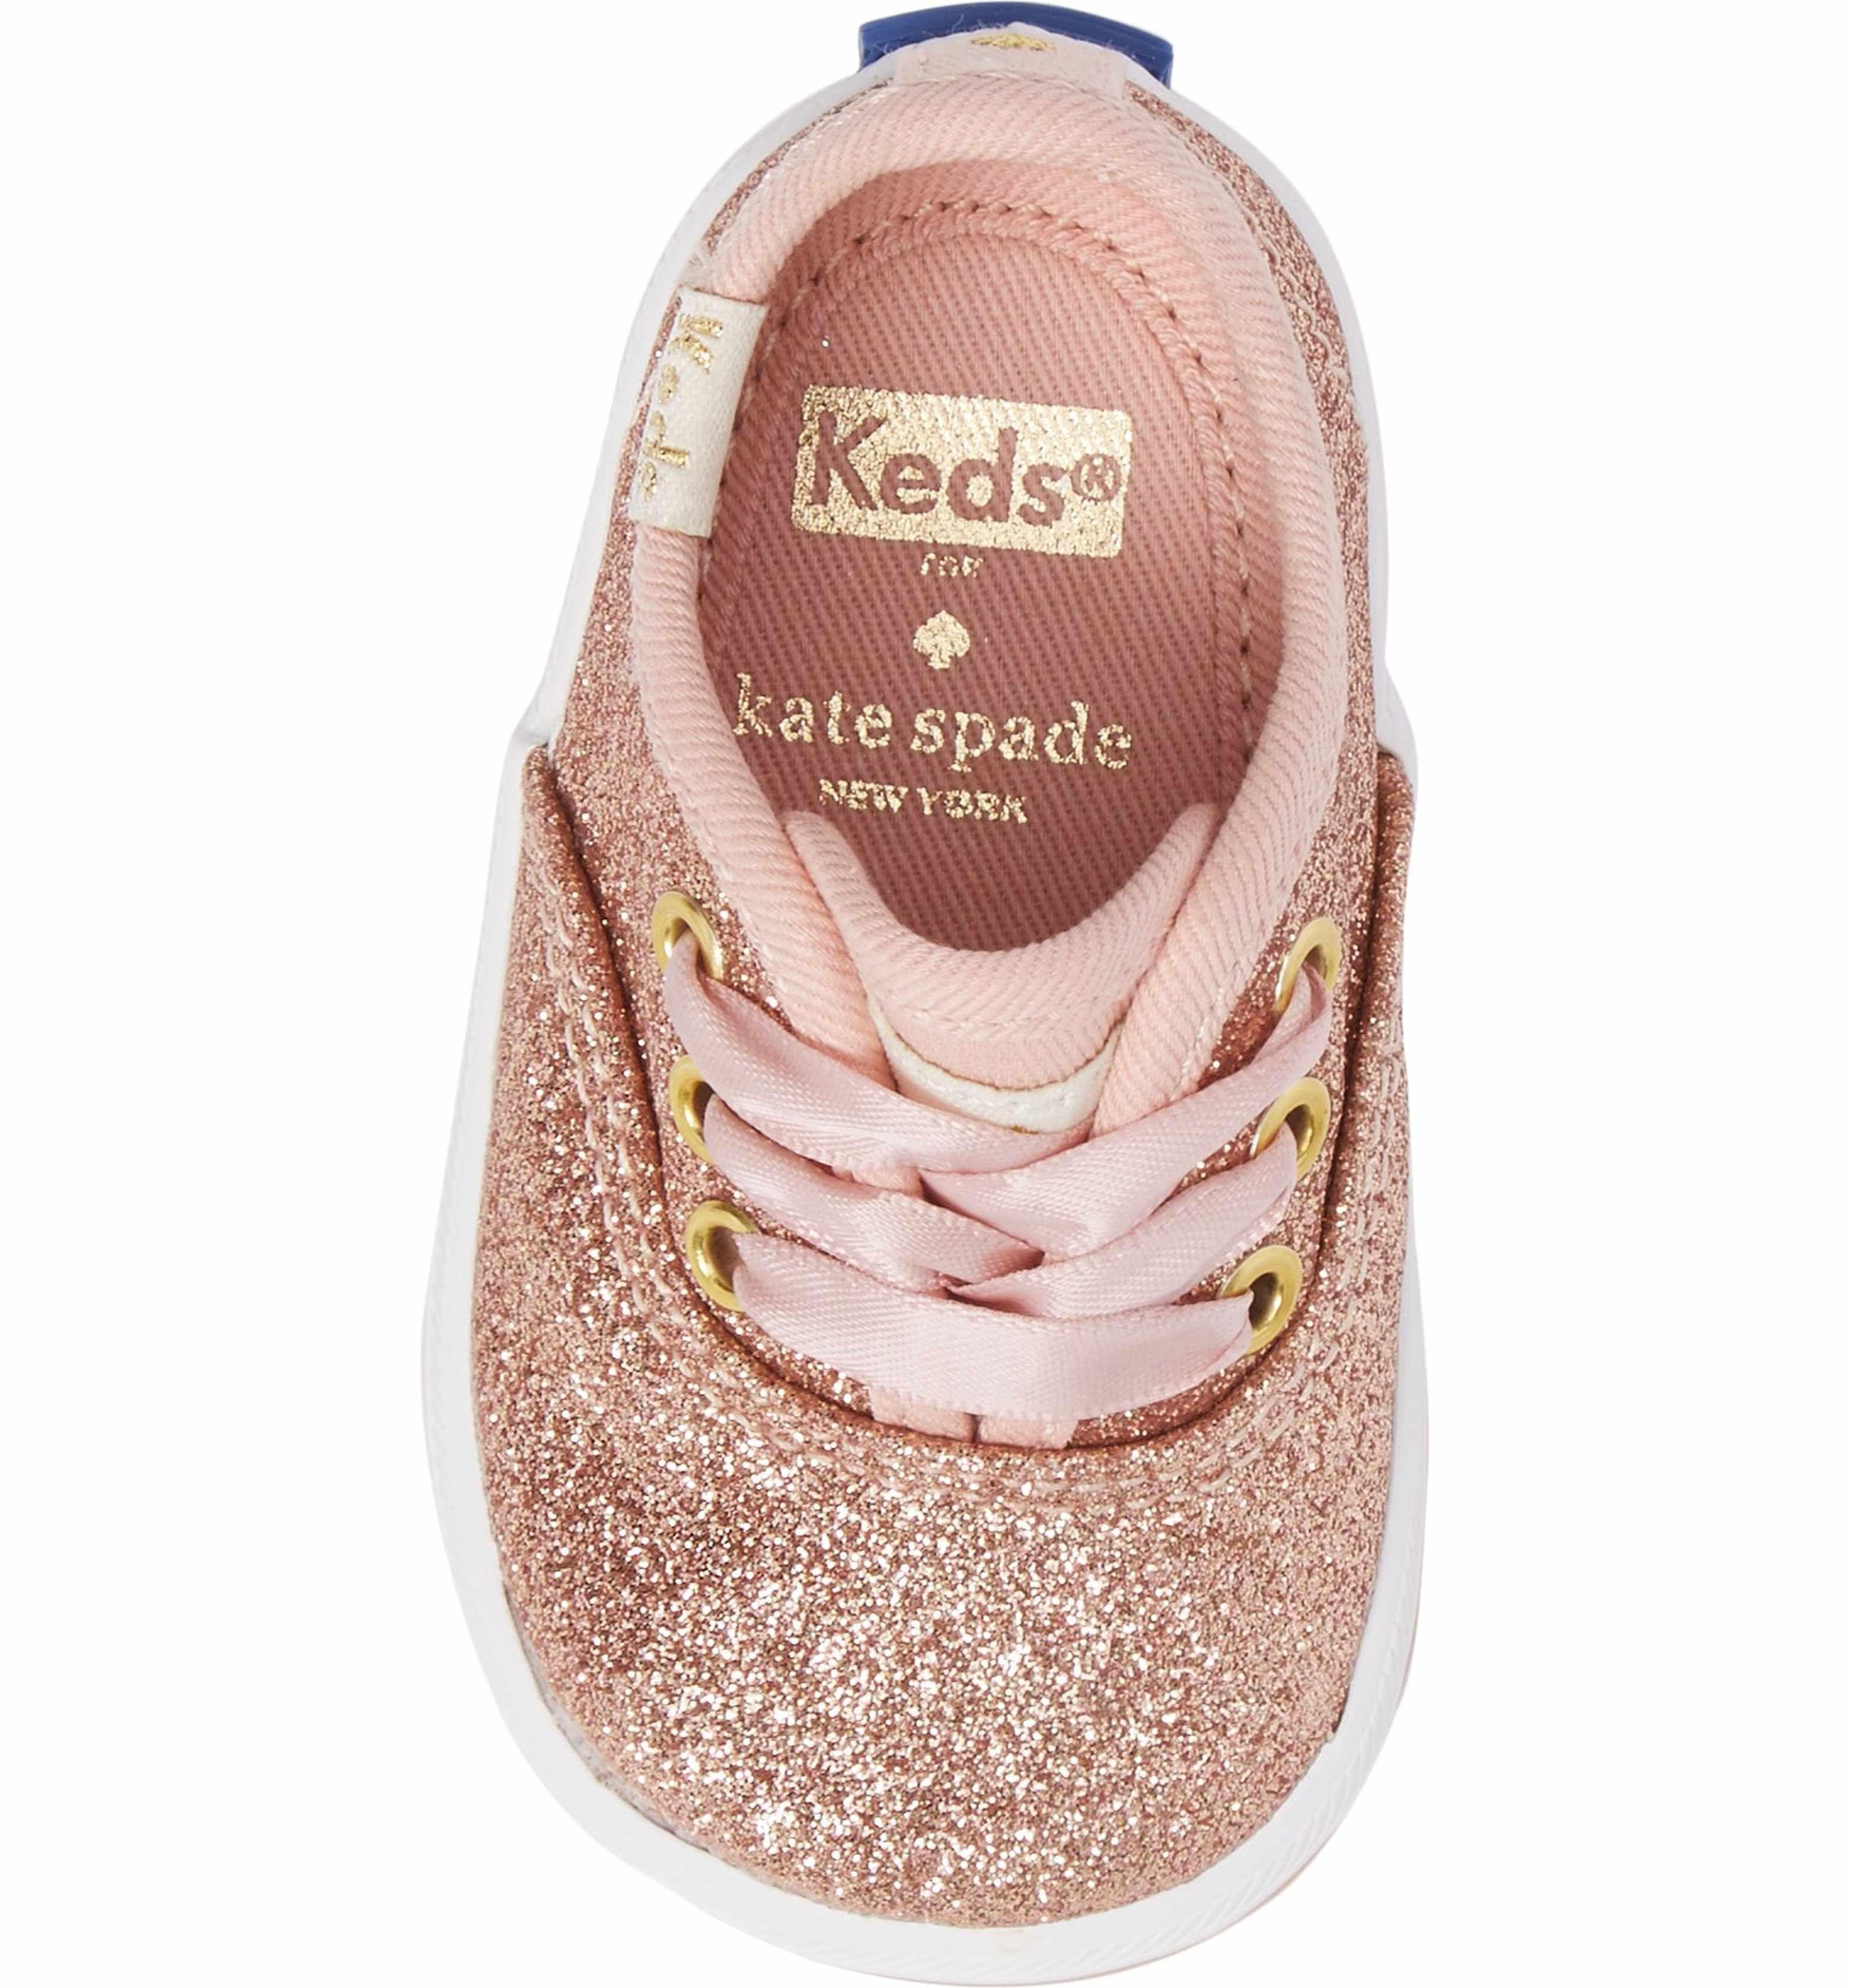 09cec0e20460 Main Image - Keds® x kate spade new york Champion Glitter Crib Shoe (Baby)